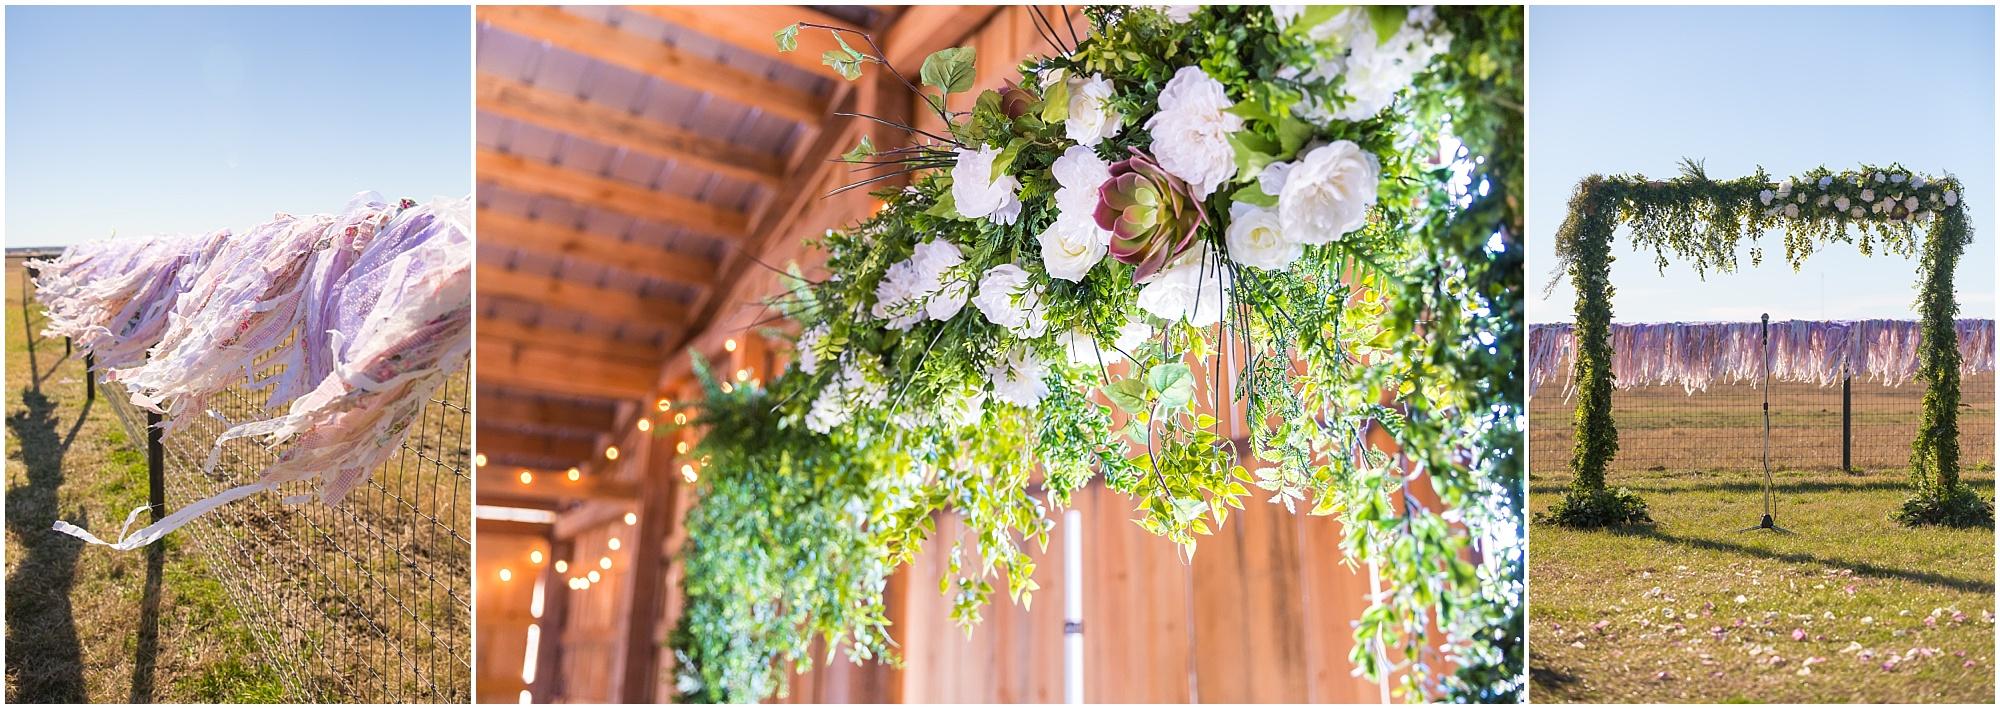 Disney-Inspired-Wedding-Central-Texas_0030.jpg